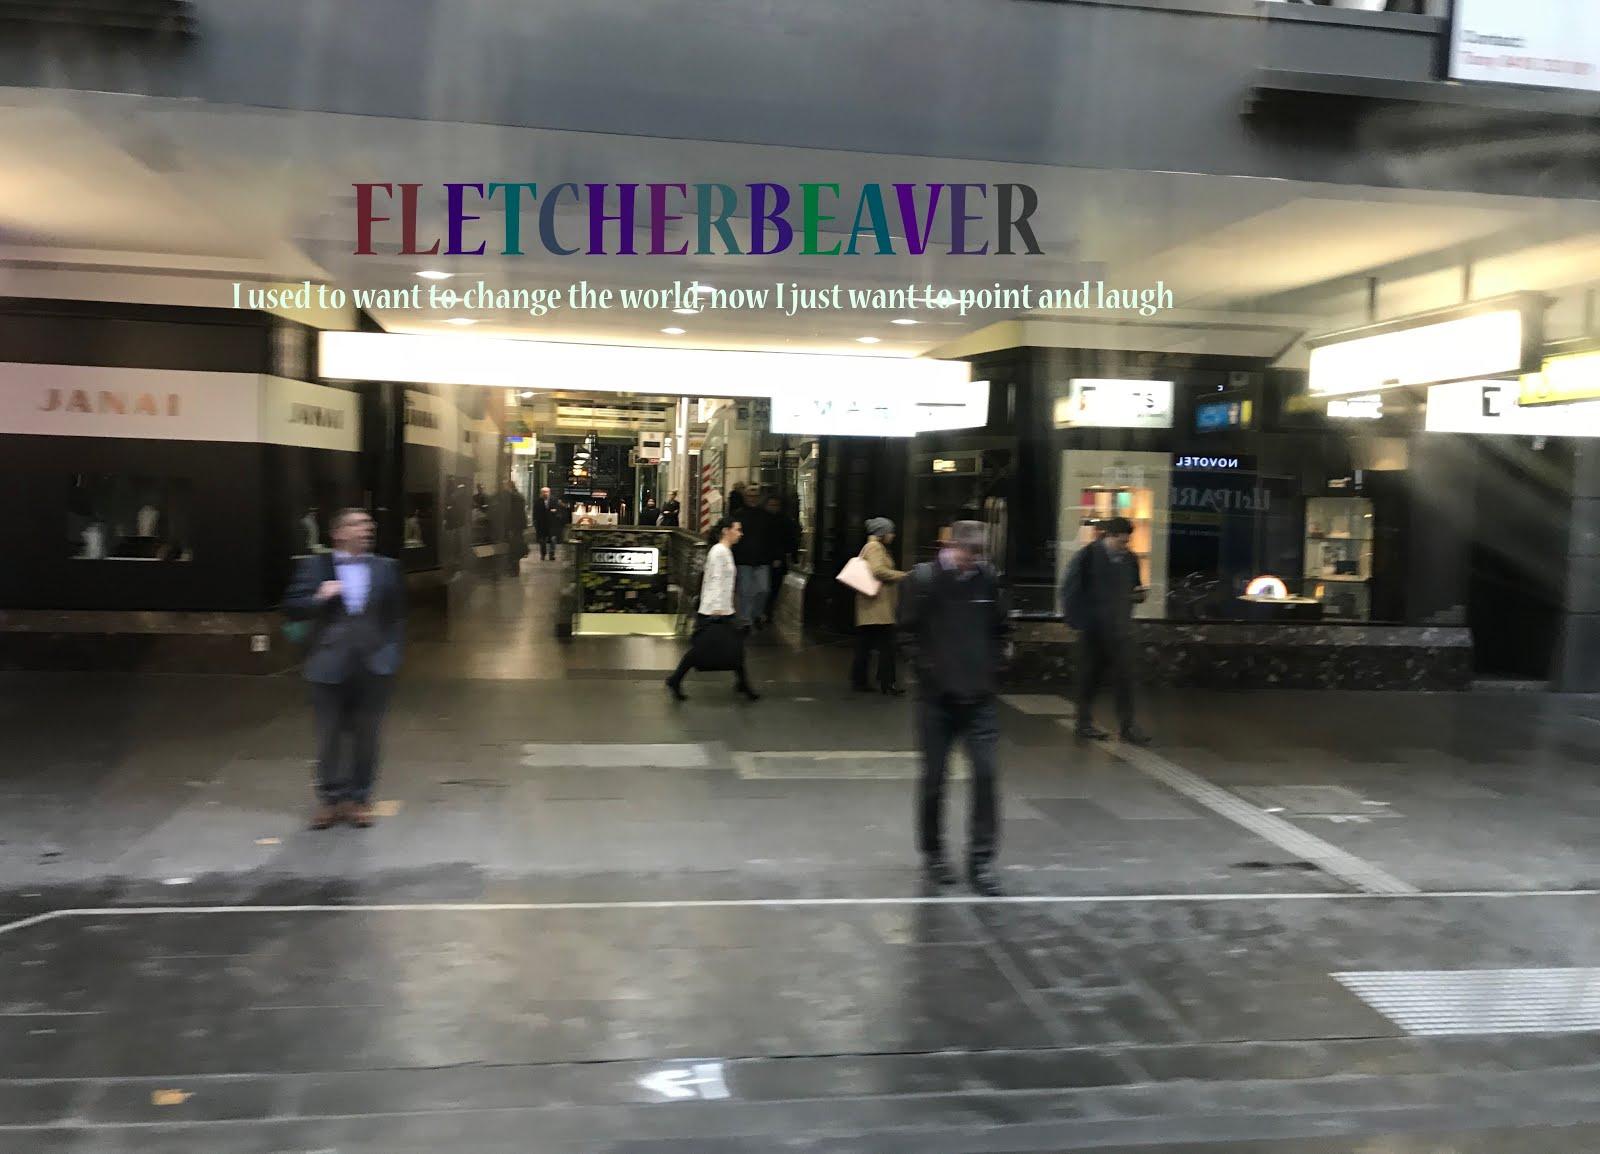 FletcherBeaver